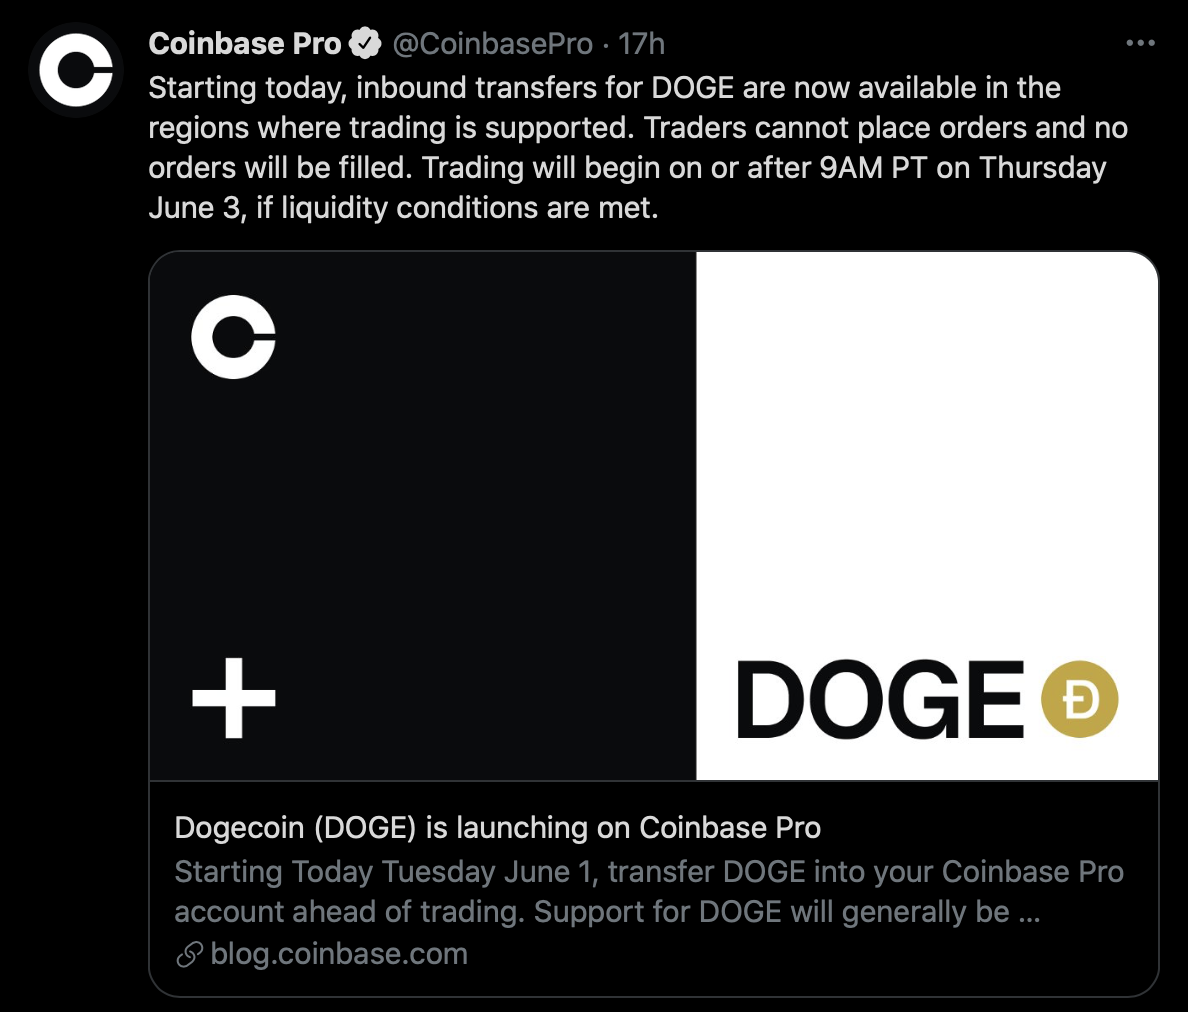 coinbase tweet Doge